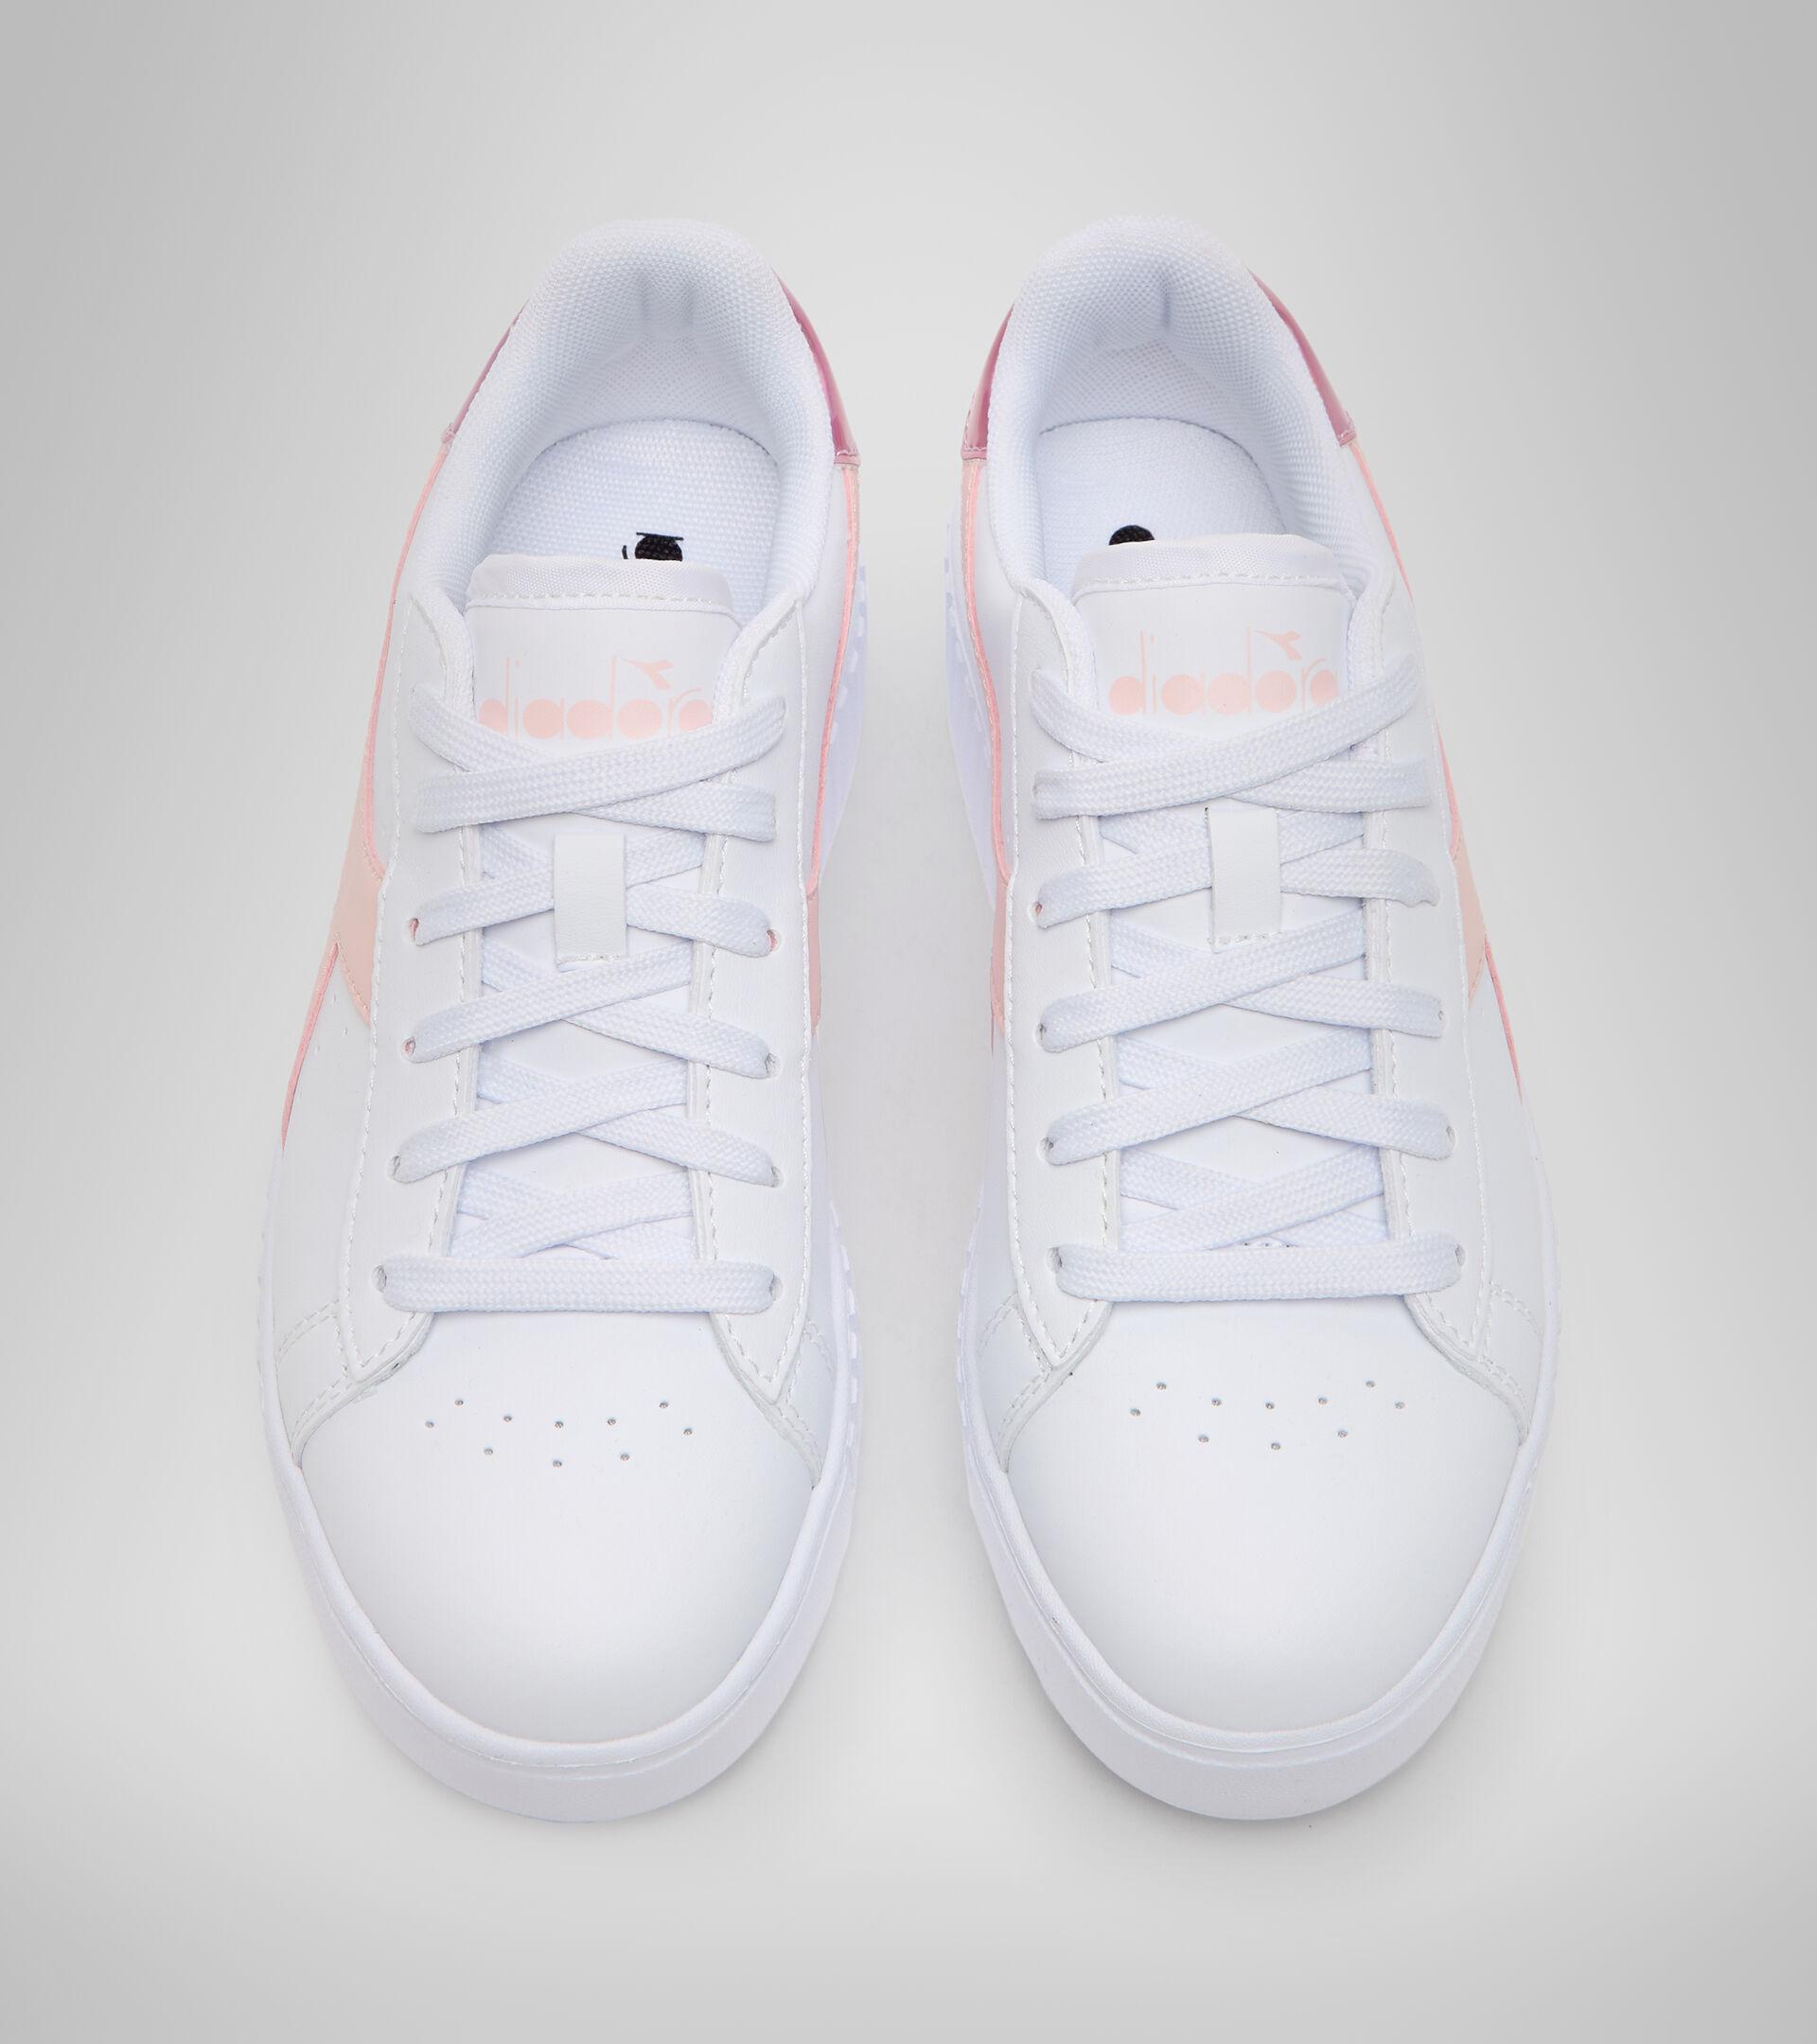 Chaussures de sport - Jeunes 8-16 ans GAME STEP GS BLANC/ROSE VOILEE - Diadora